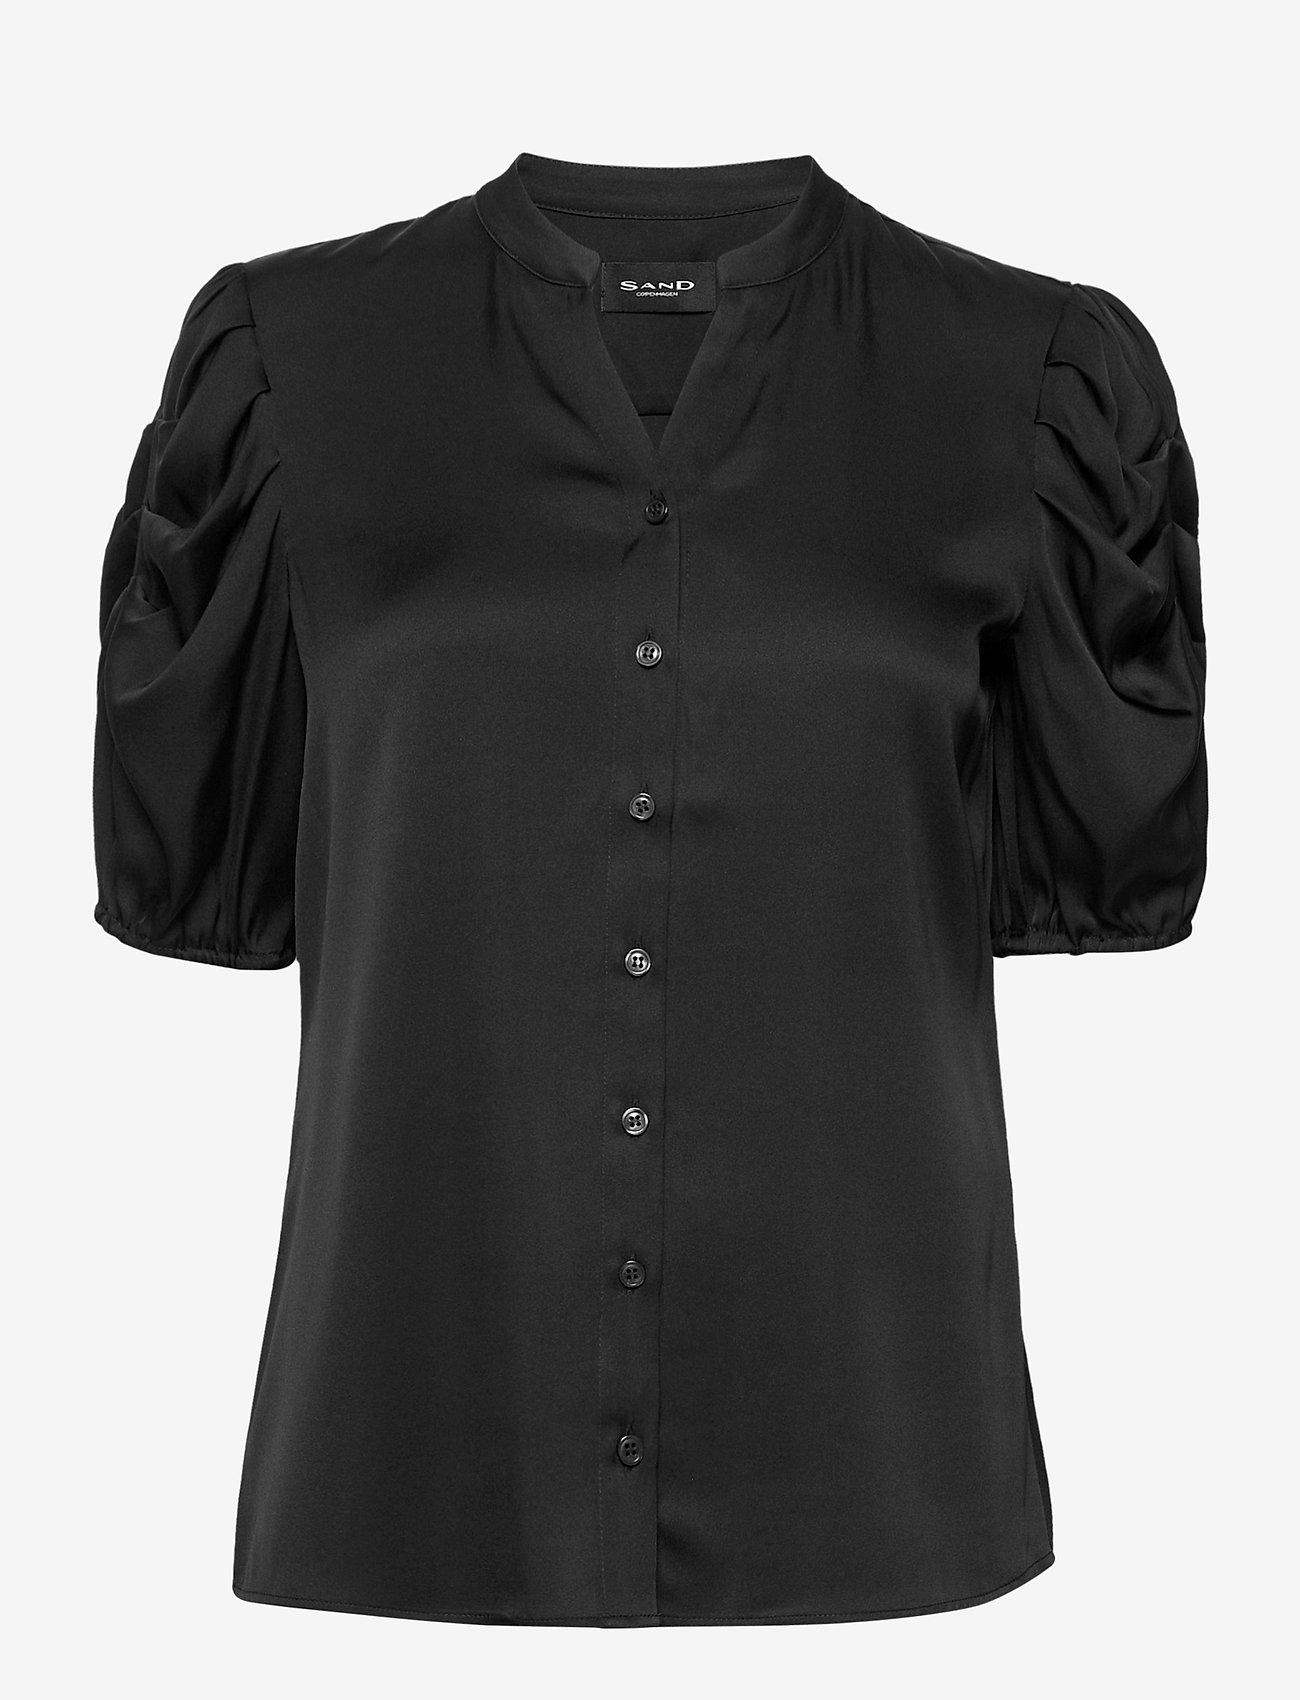 SAND - Satin Stretch - Naolin - short-sleeved blouses - black - 0